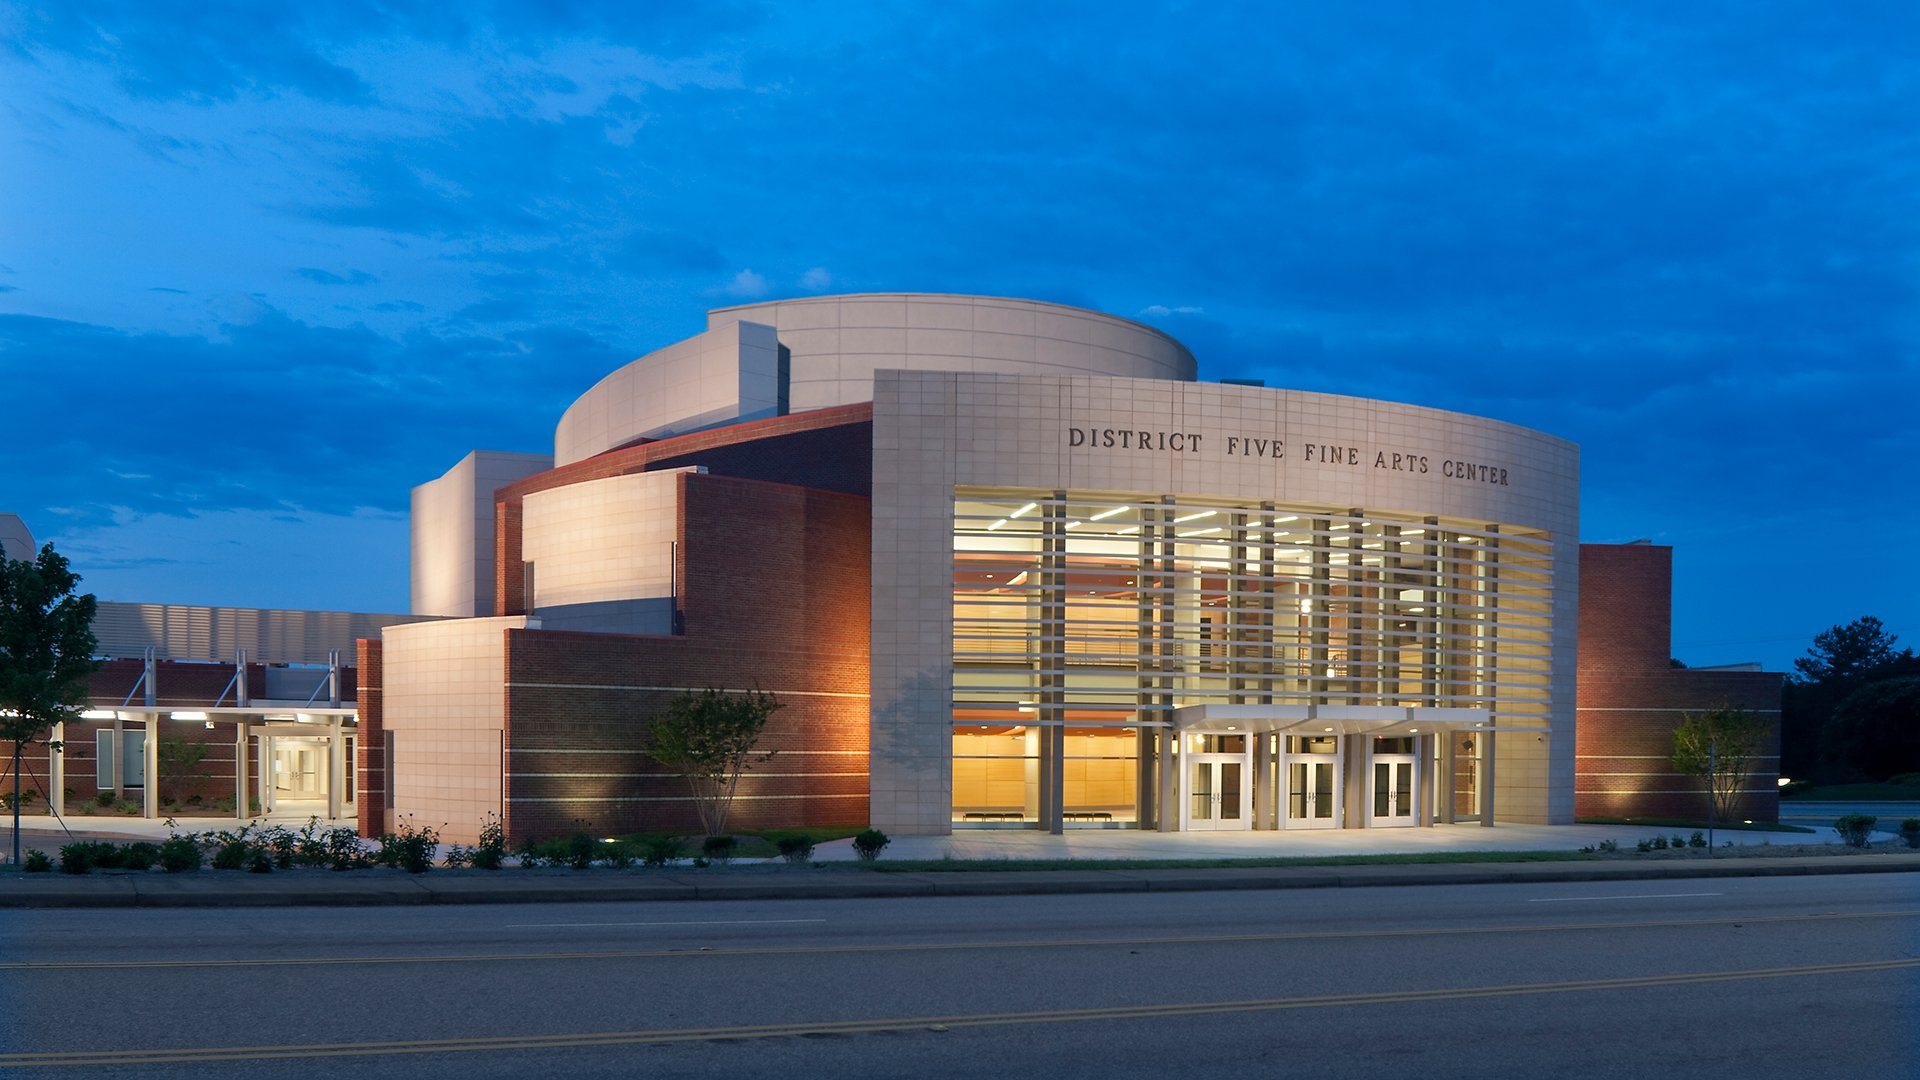 District Five Fine Arts Center, Spartanburg School District 5